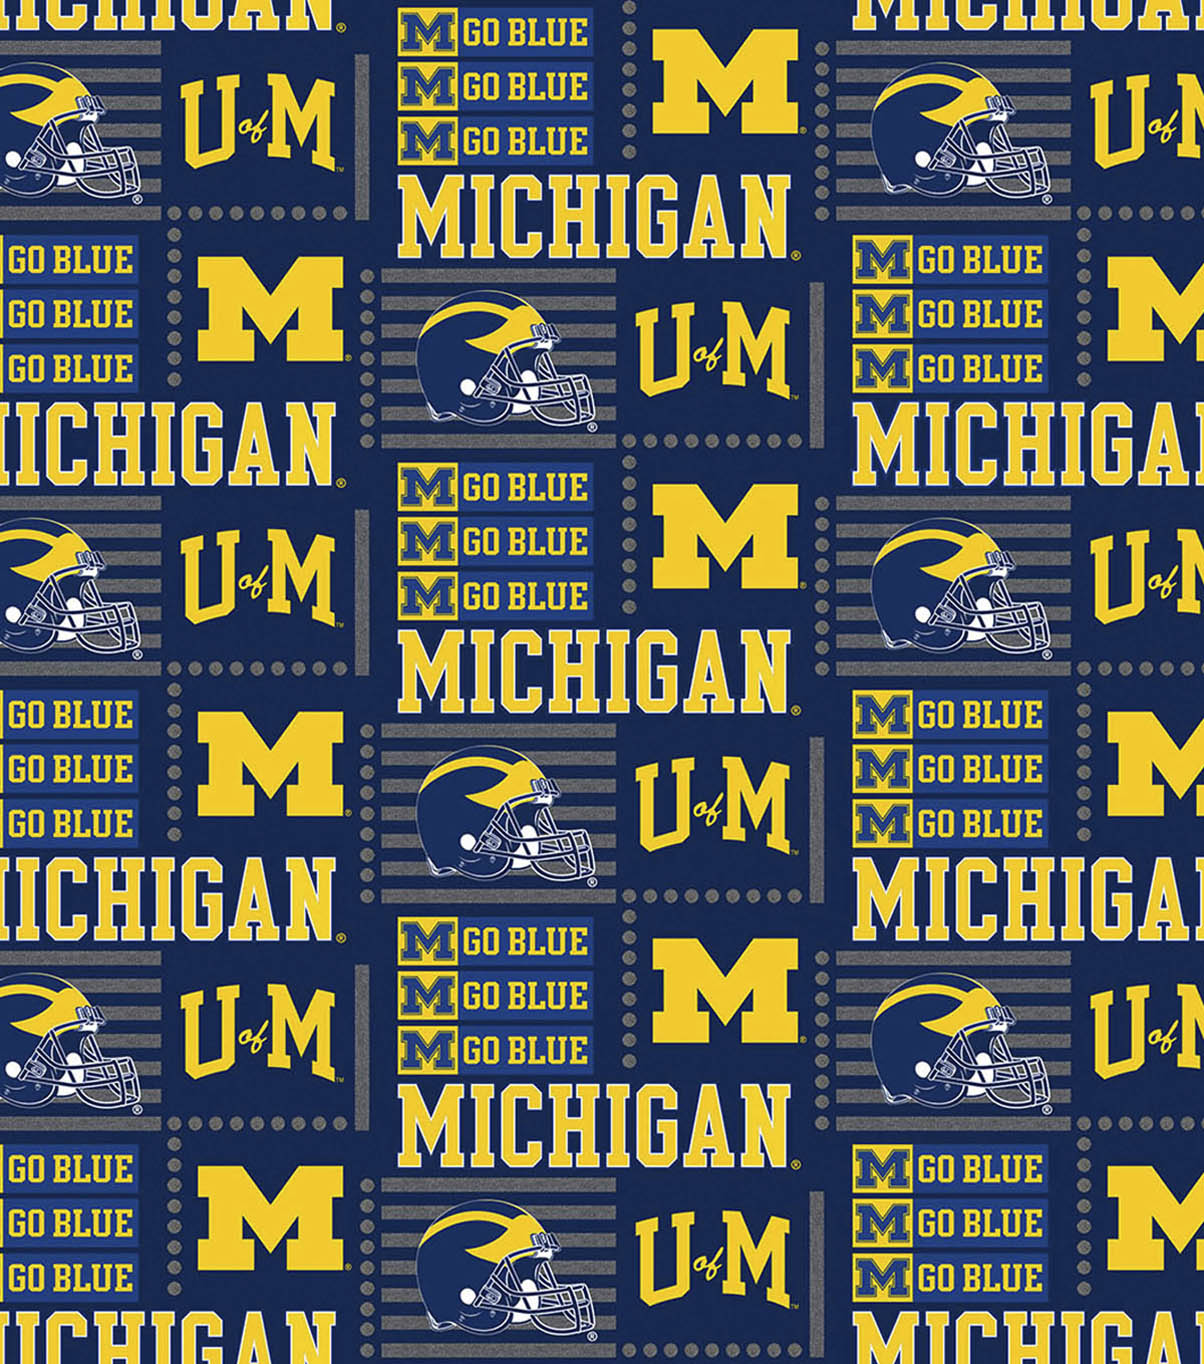 University Of Michigan Wolverines Cotton Fabric Patch Logo